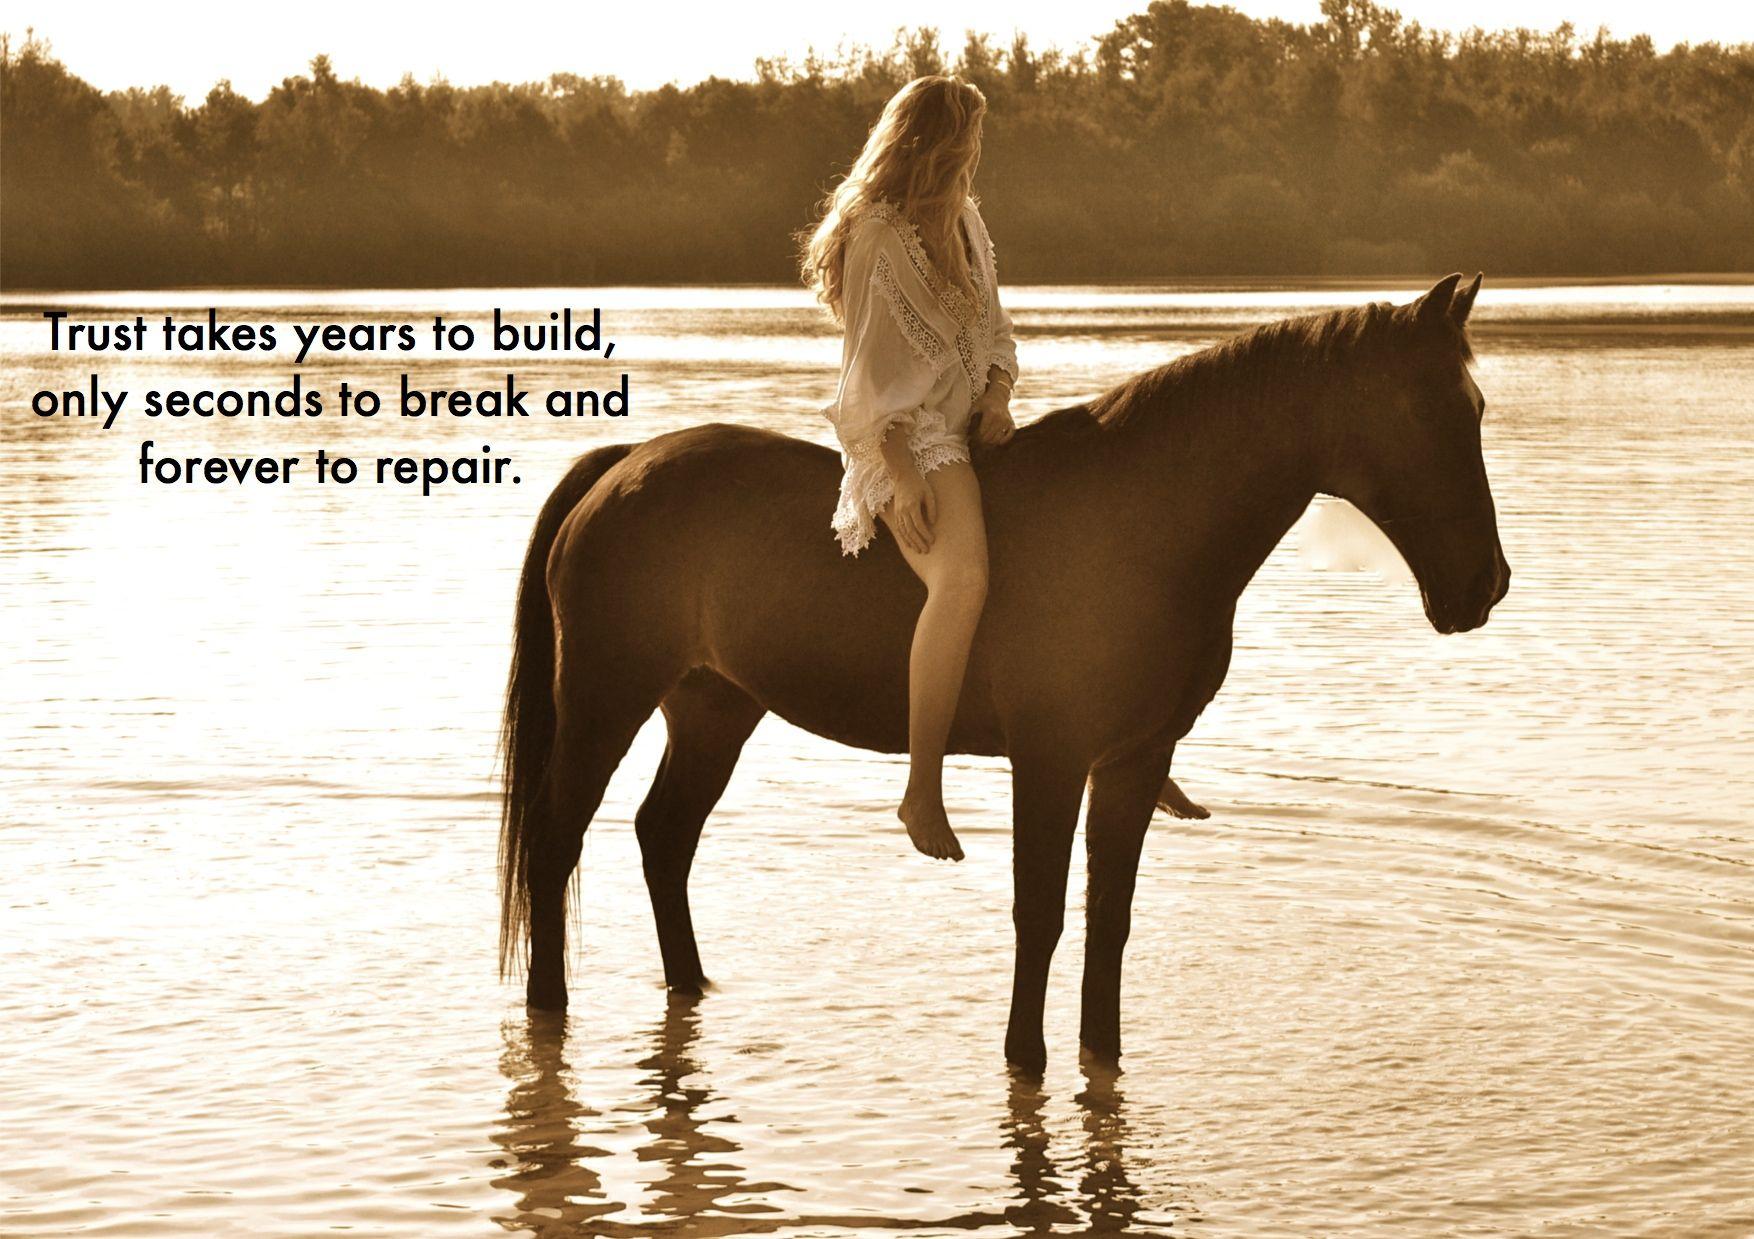 horse, girl, trust